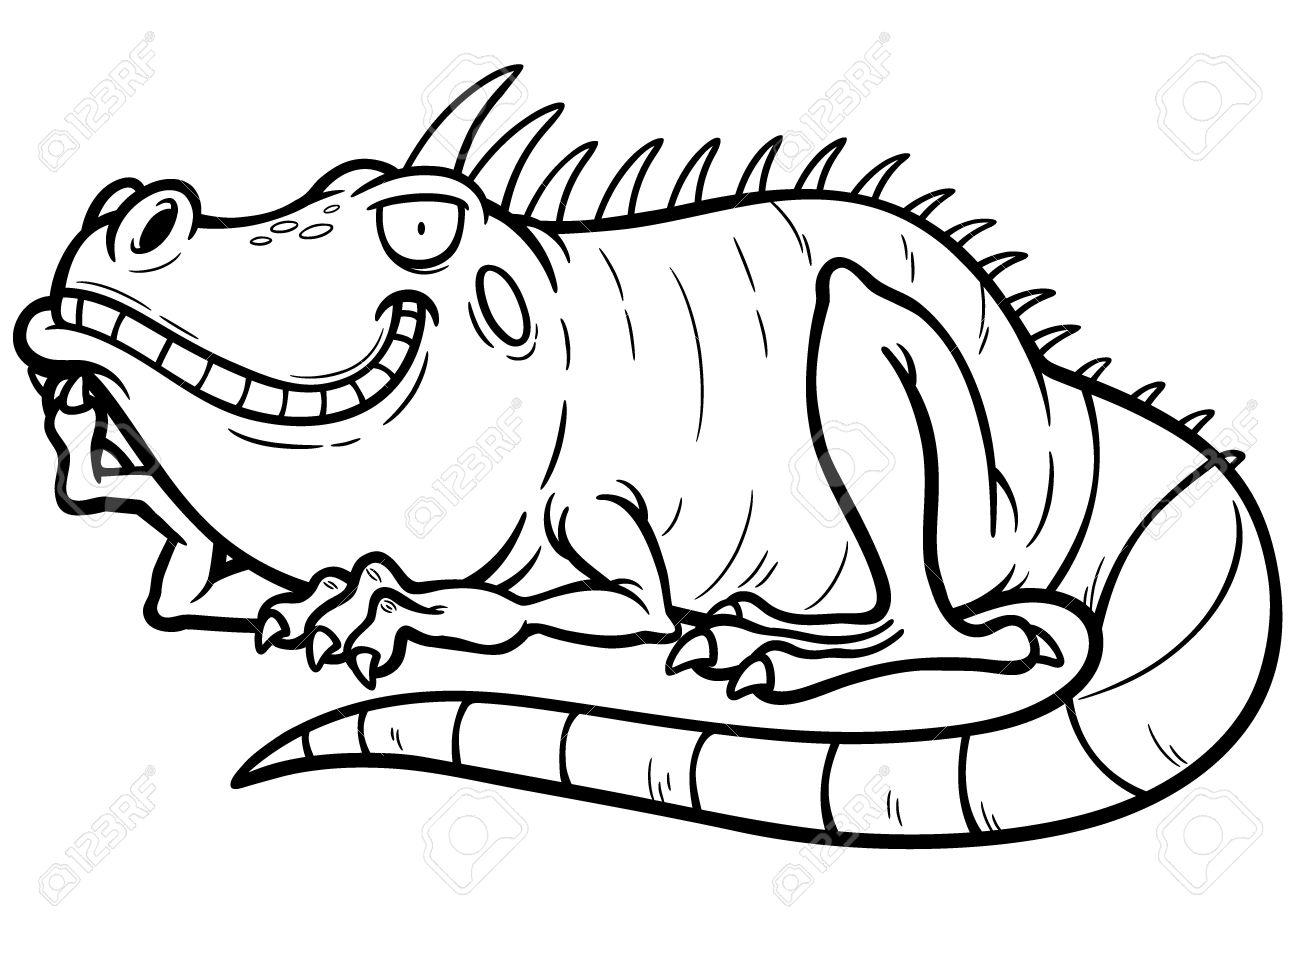 green iguana coloring page green iguana lizard coloring pages print coloring 2019 green coloring page iguana